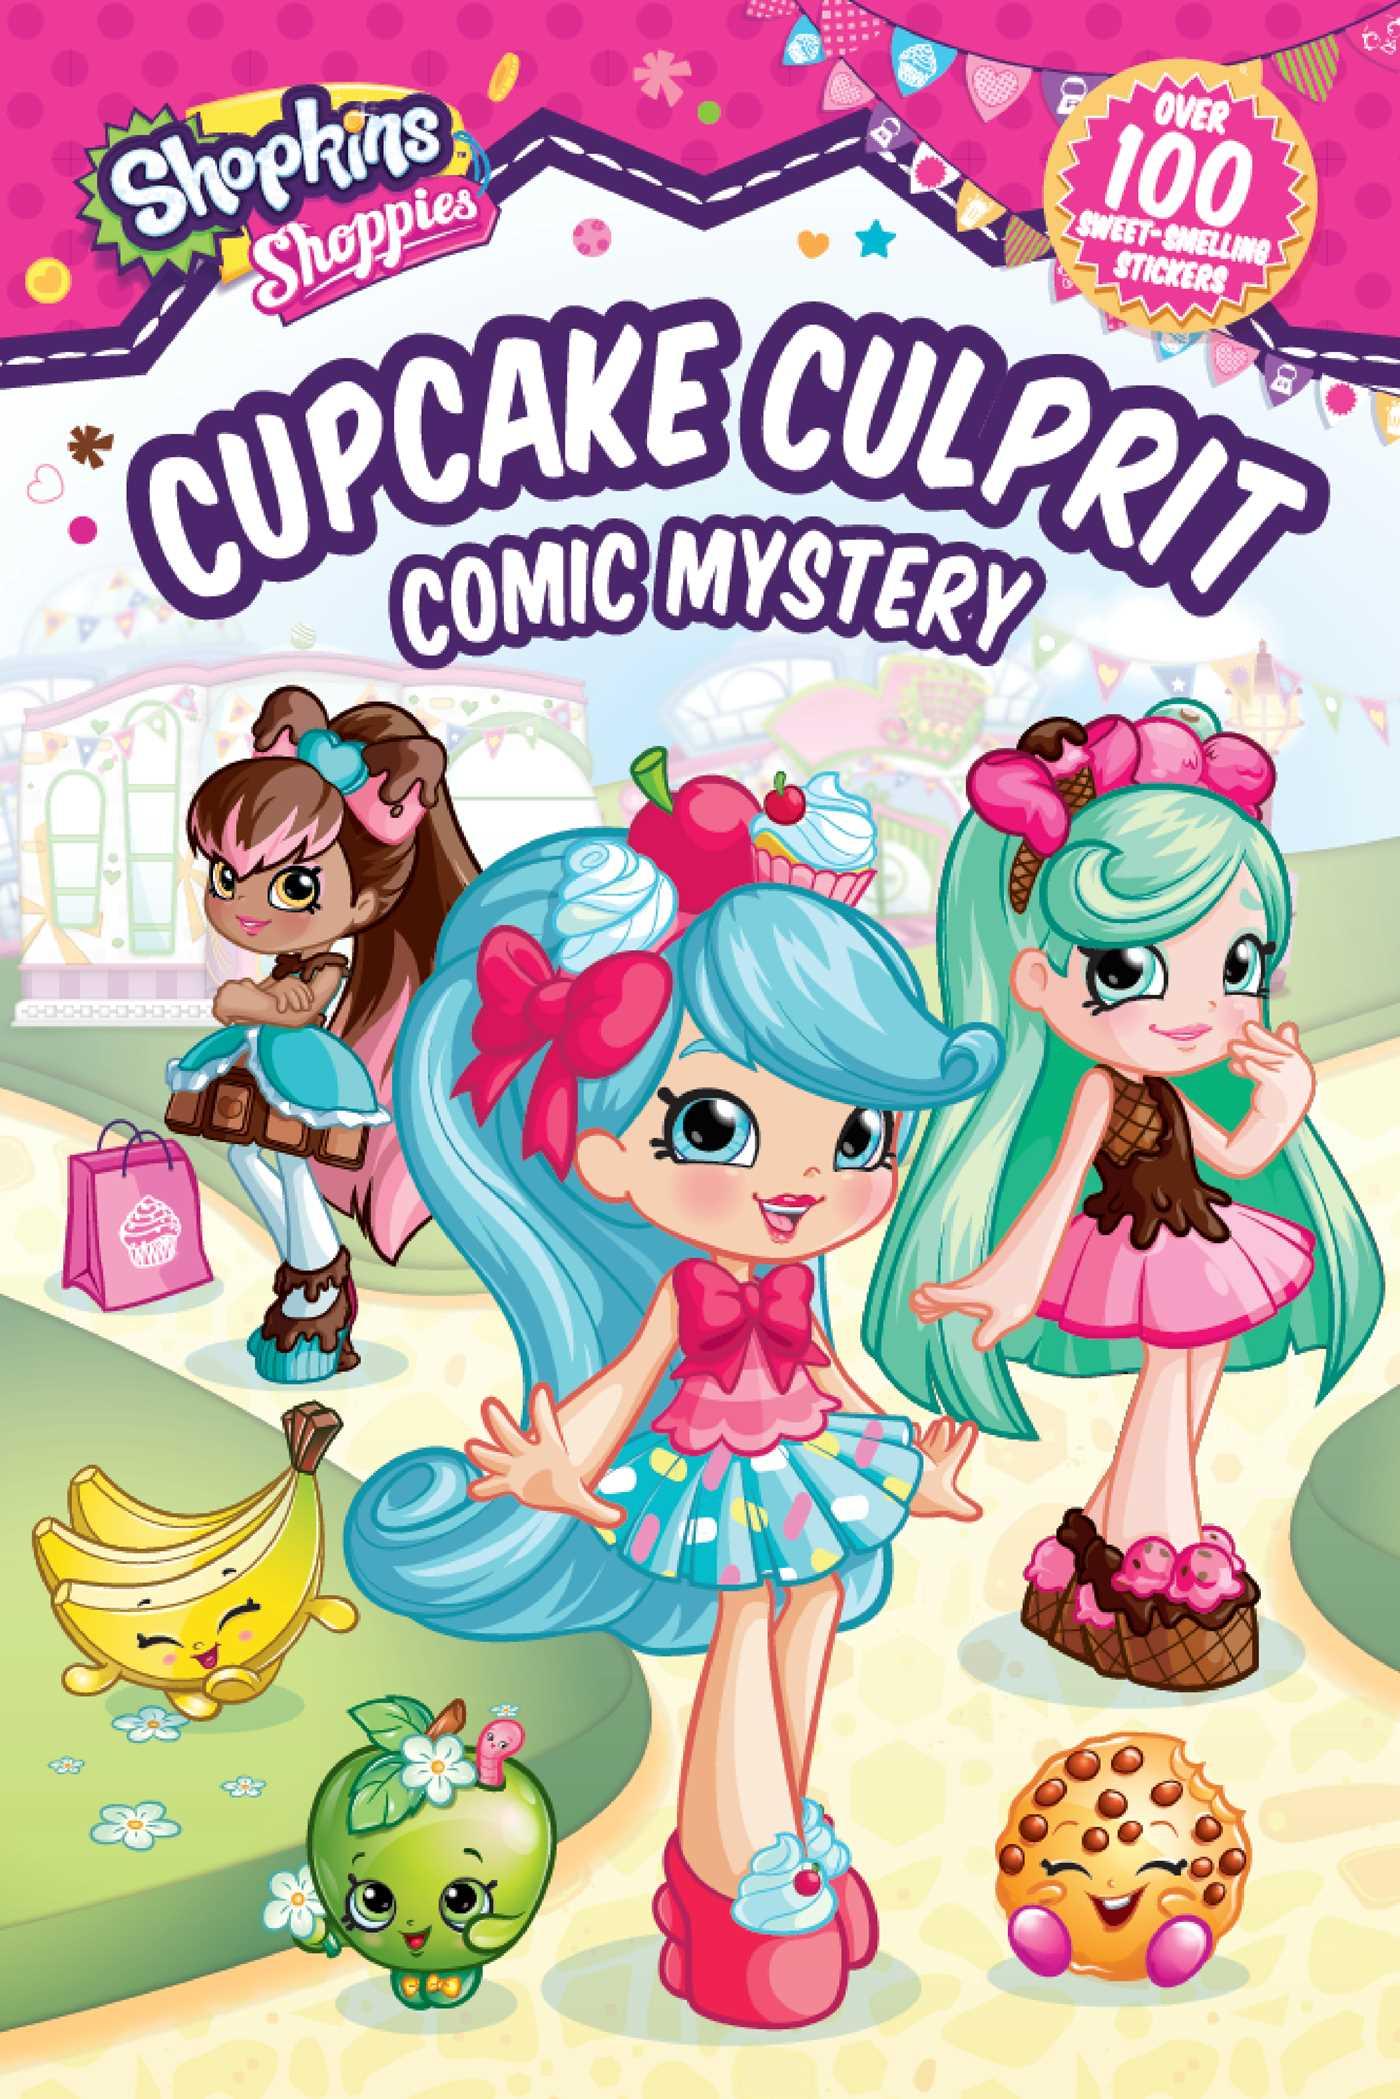 Shoppies cupcake culprit comic mystery 9781499807820 hr